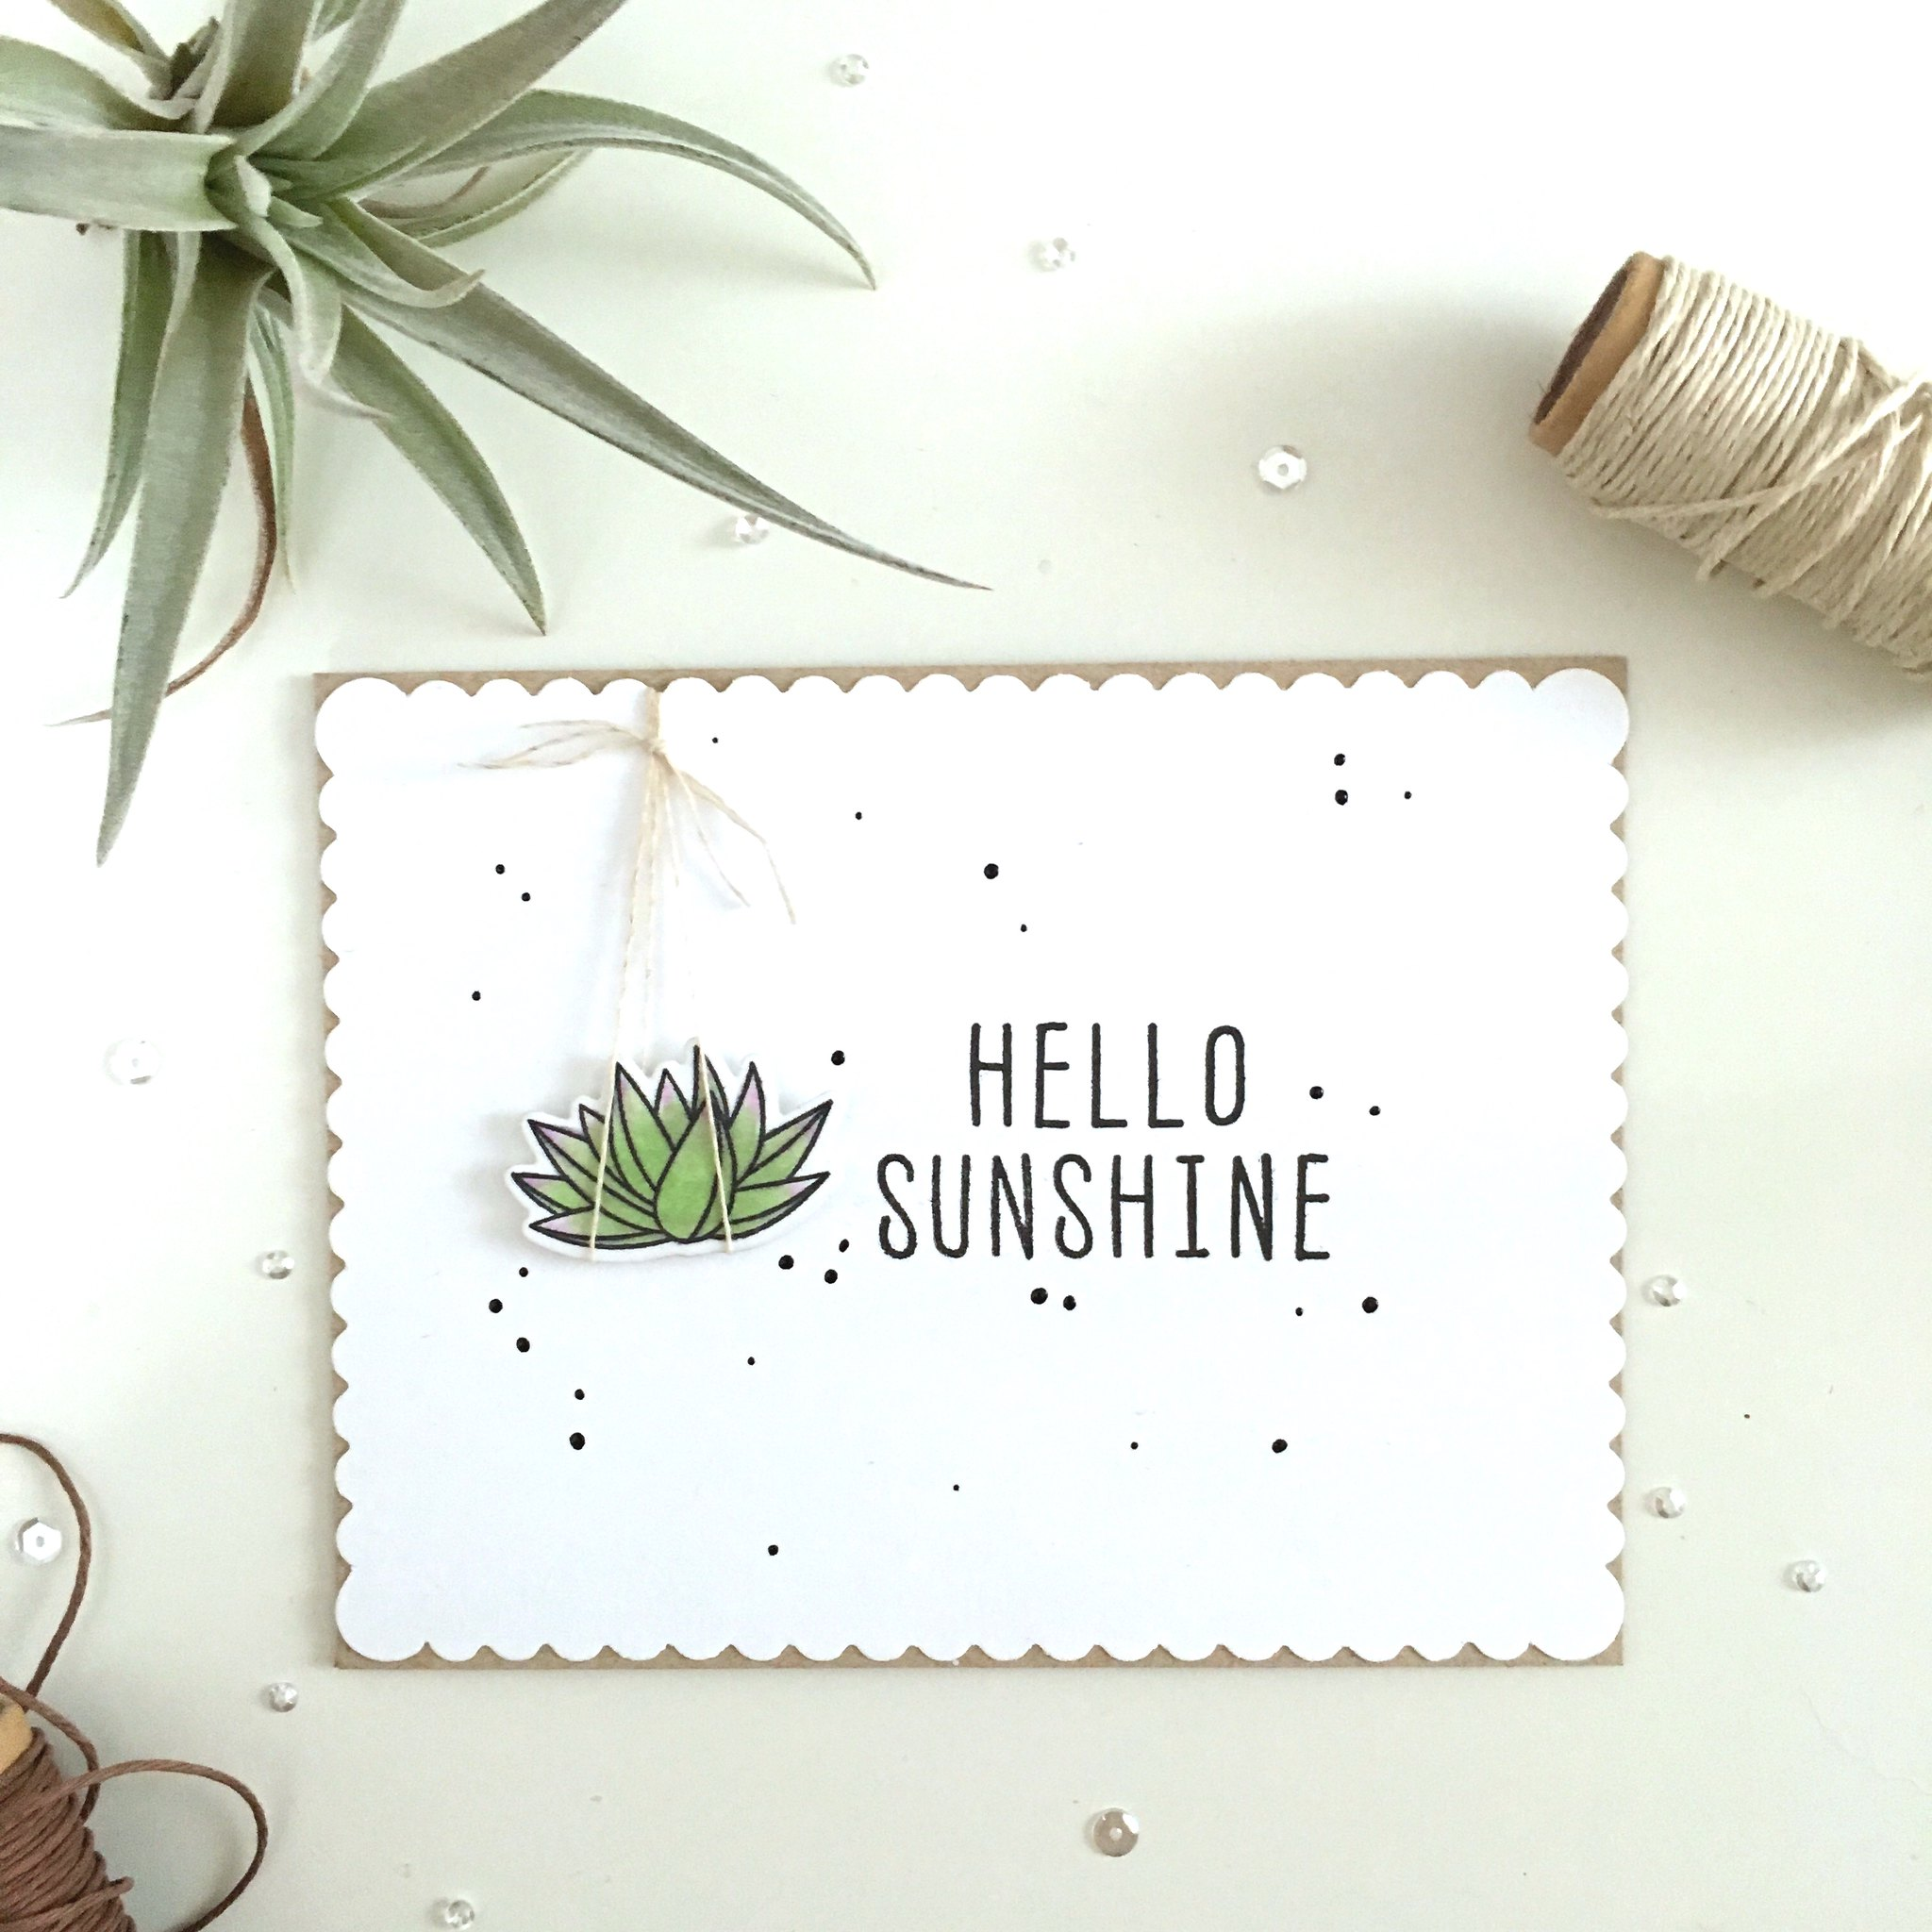 Hello Sunshine mft sweet succulents